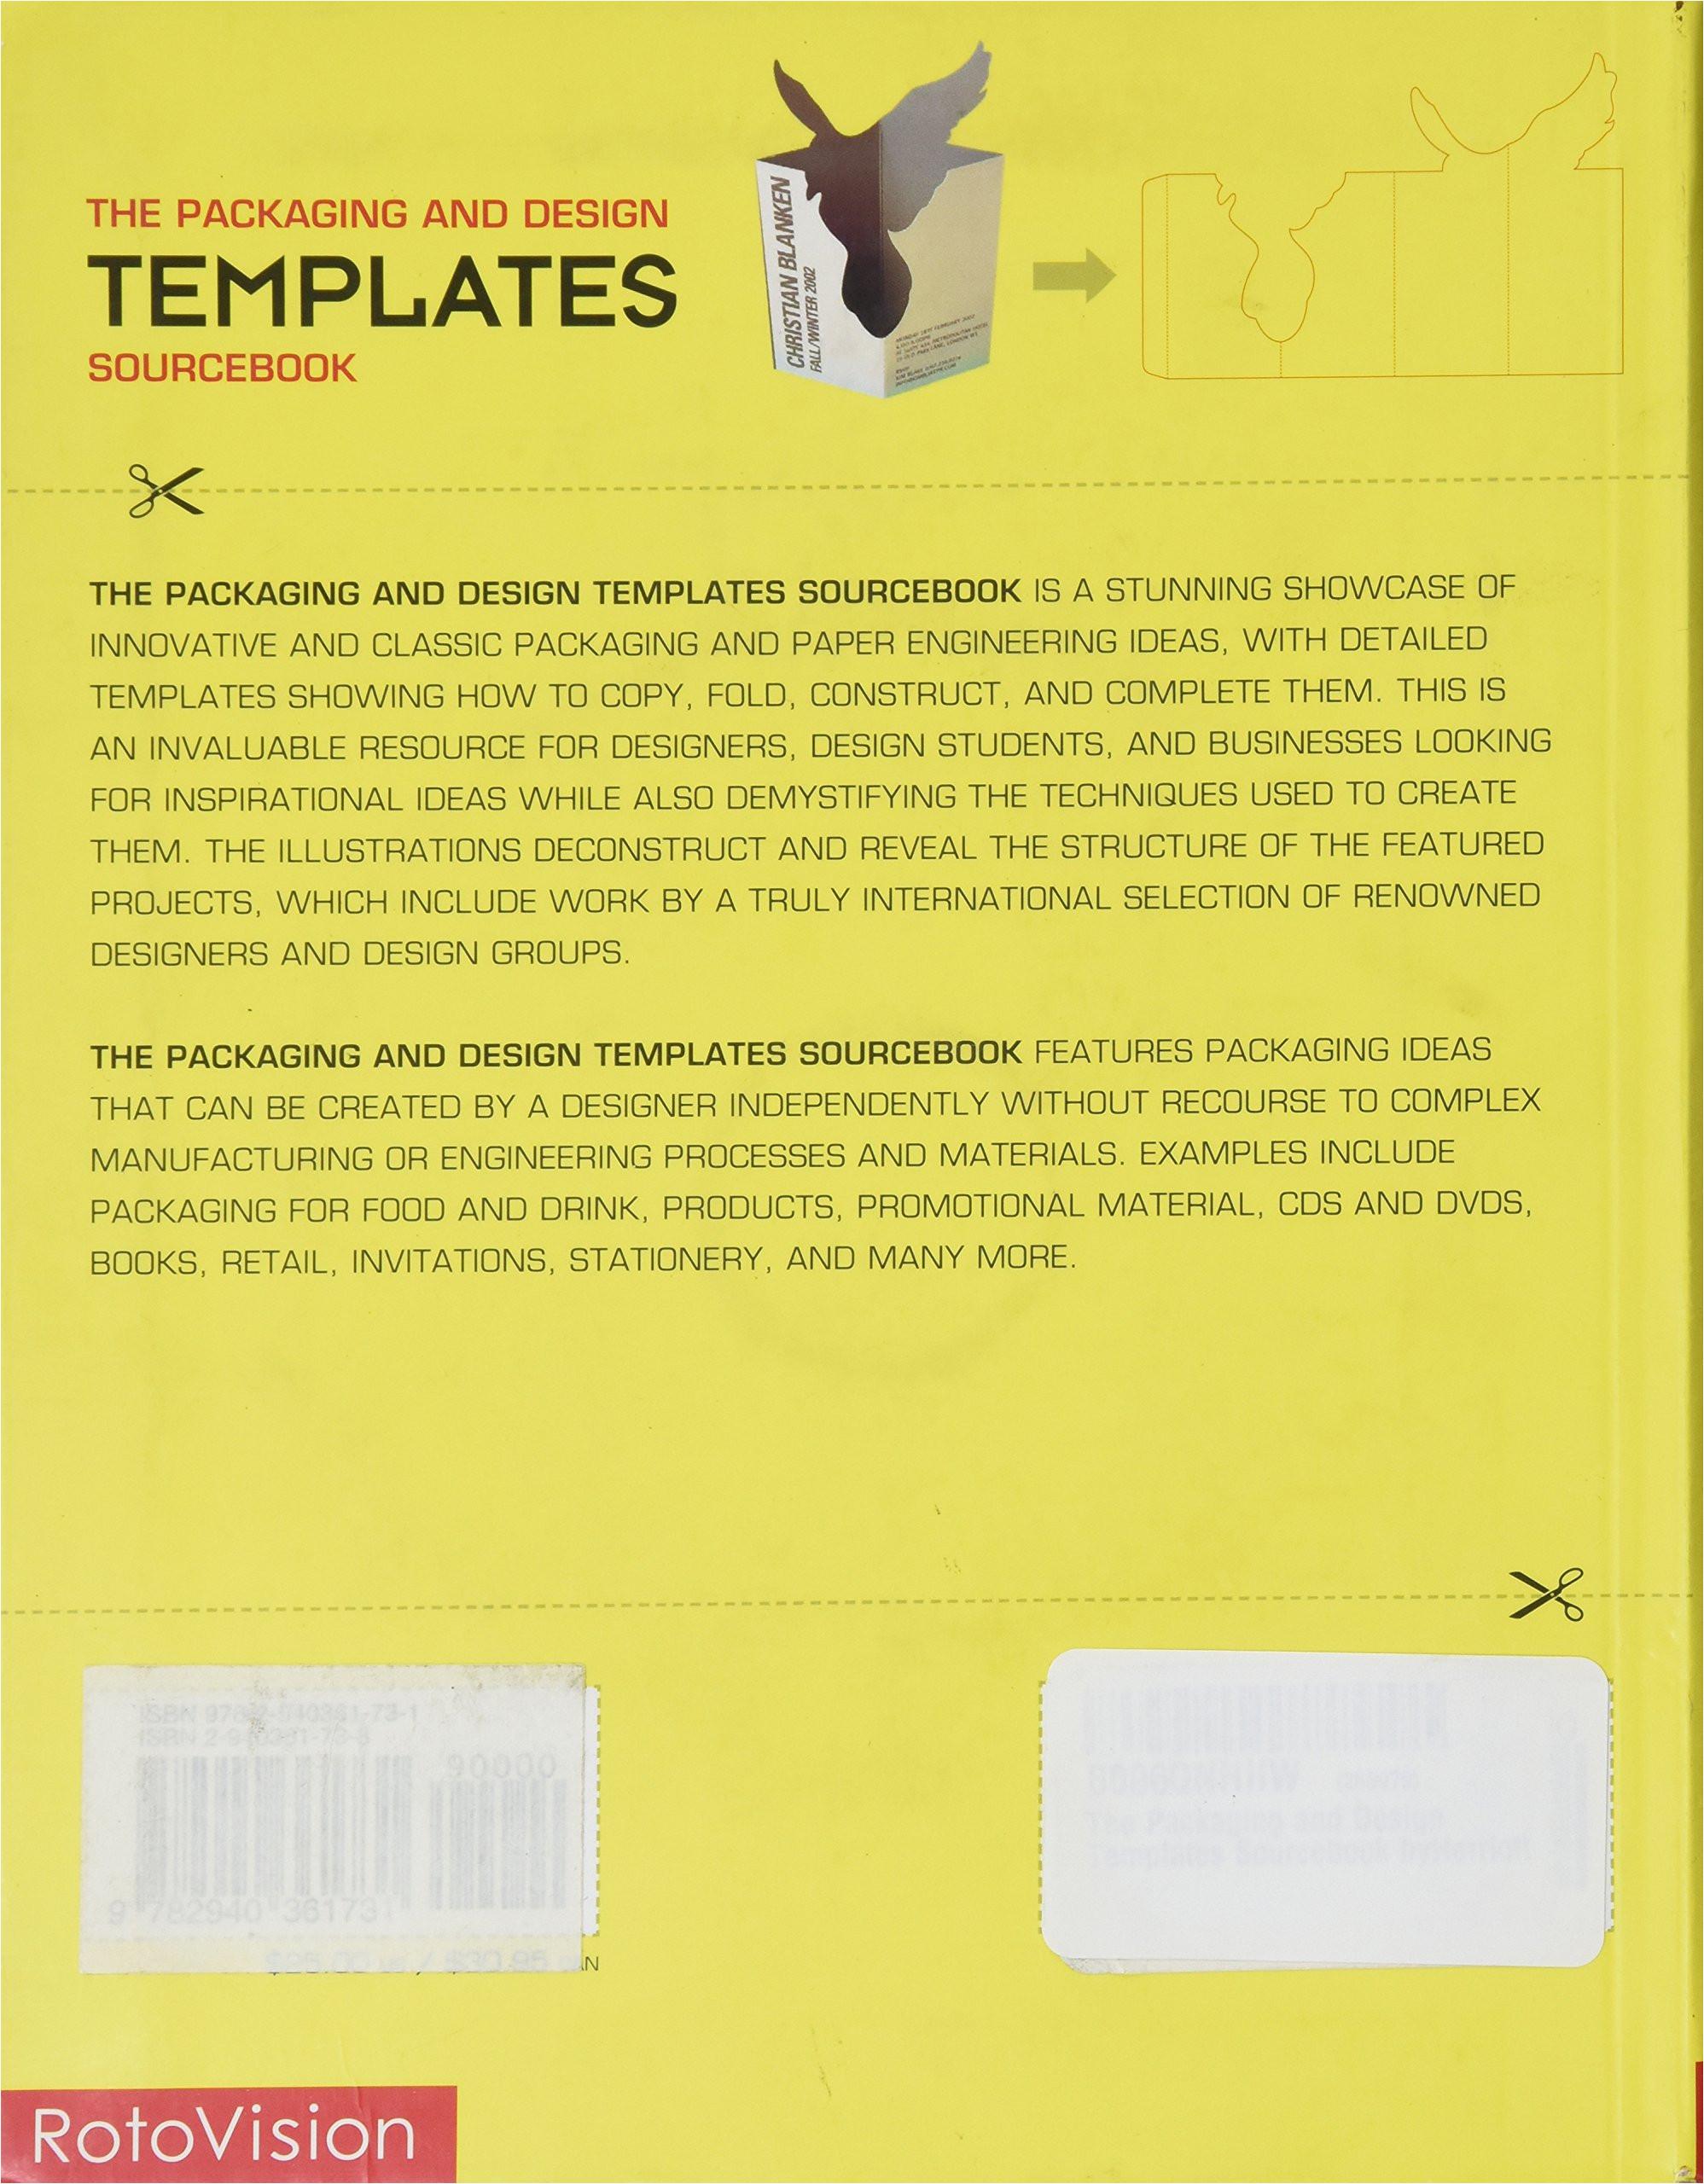 packaging design templates sourcebook